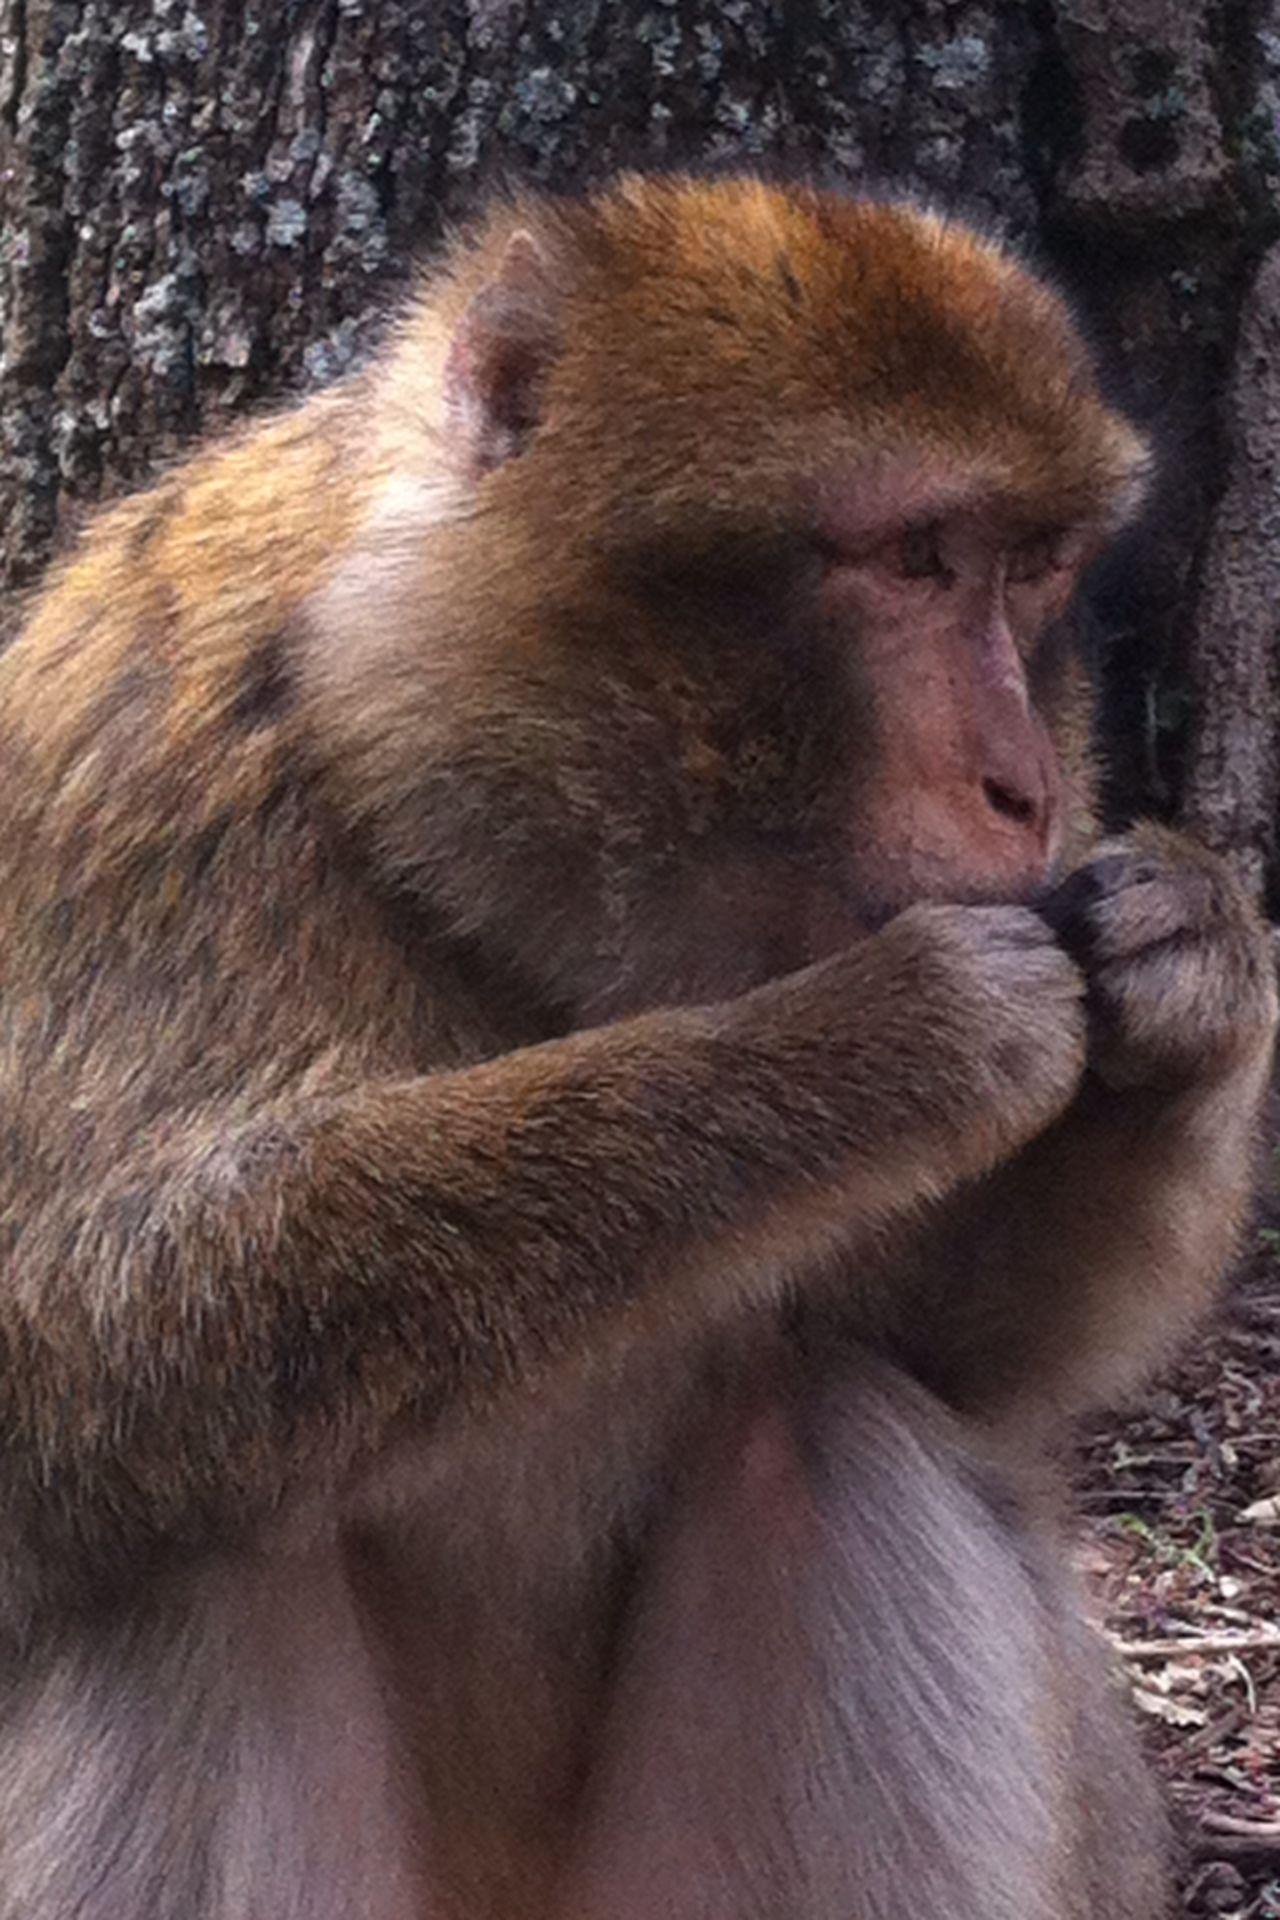 Eatingpistachio Monkey Animal Azrou Morocco Playful Friendly Funtimes